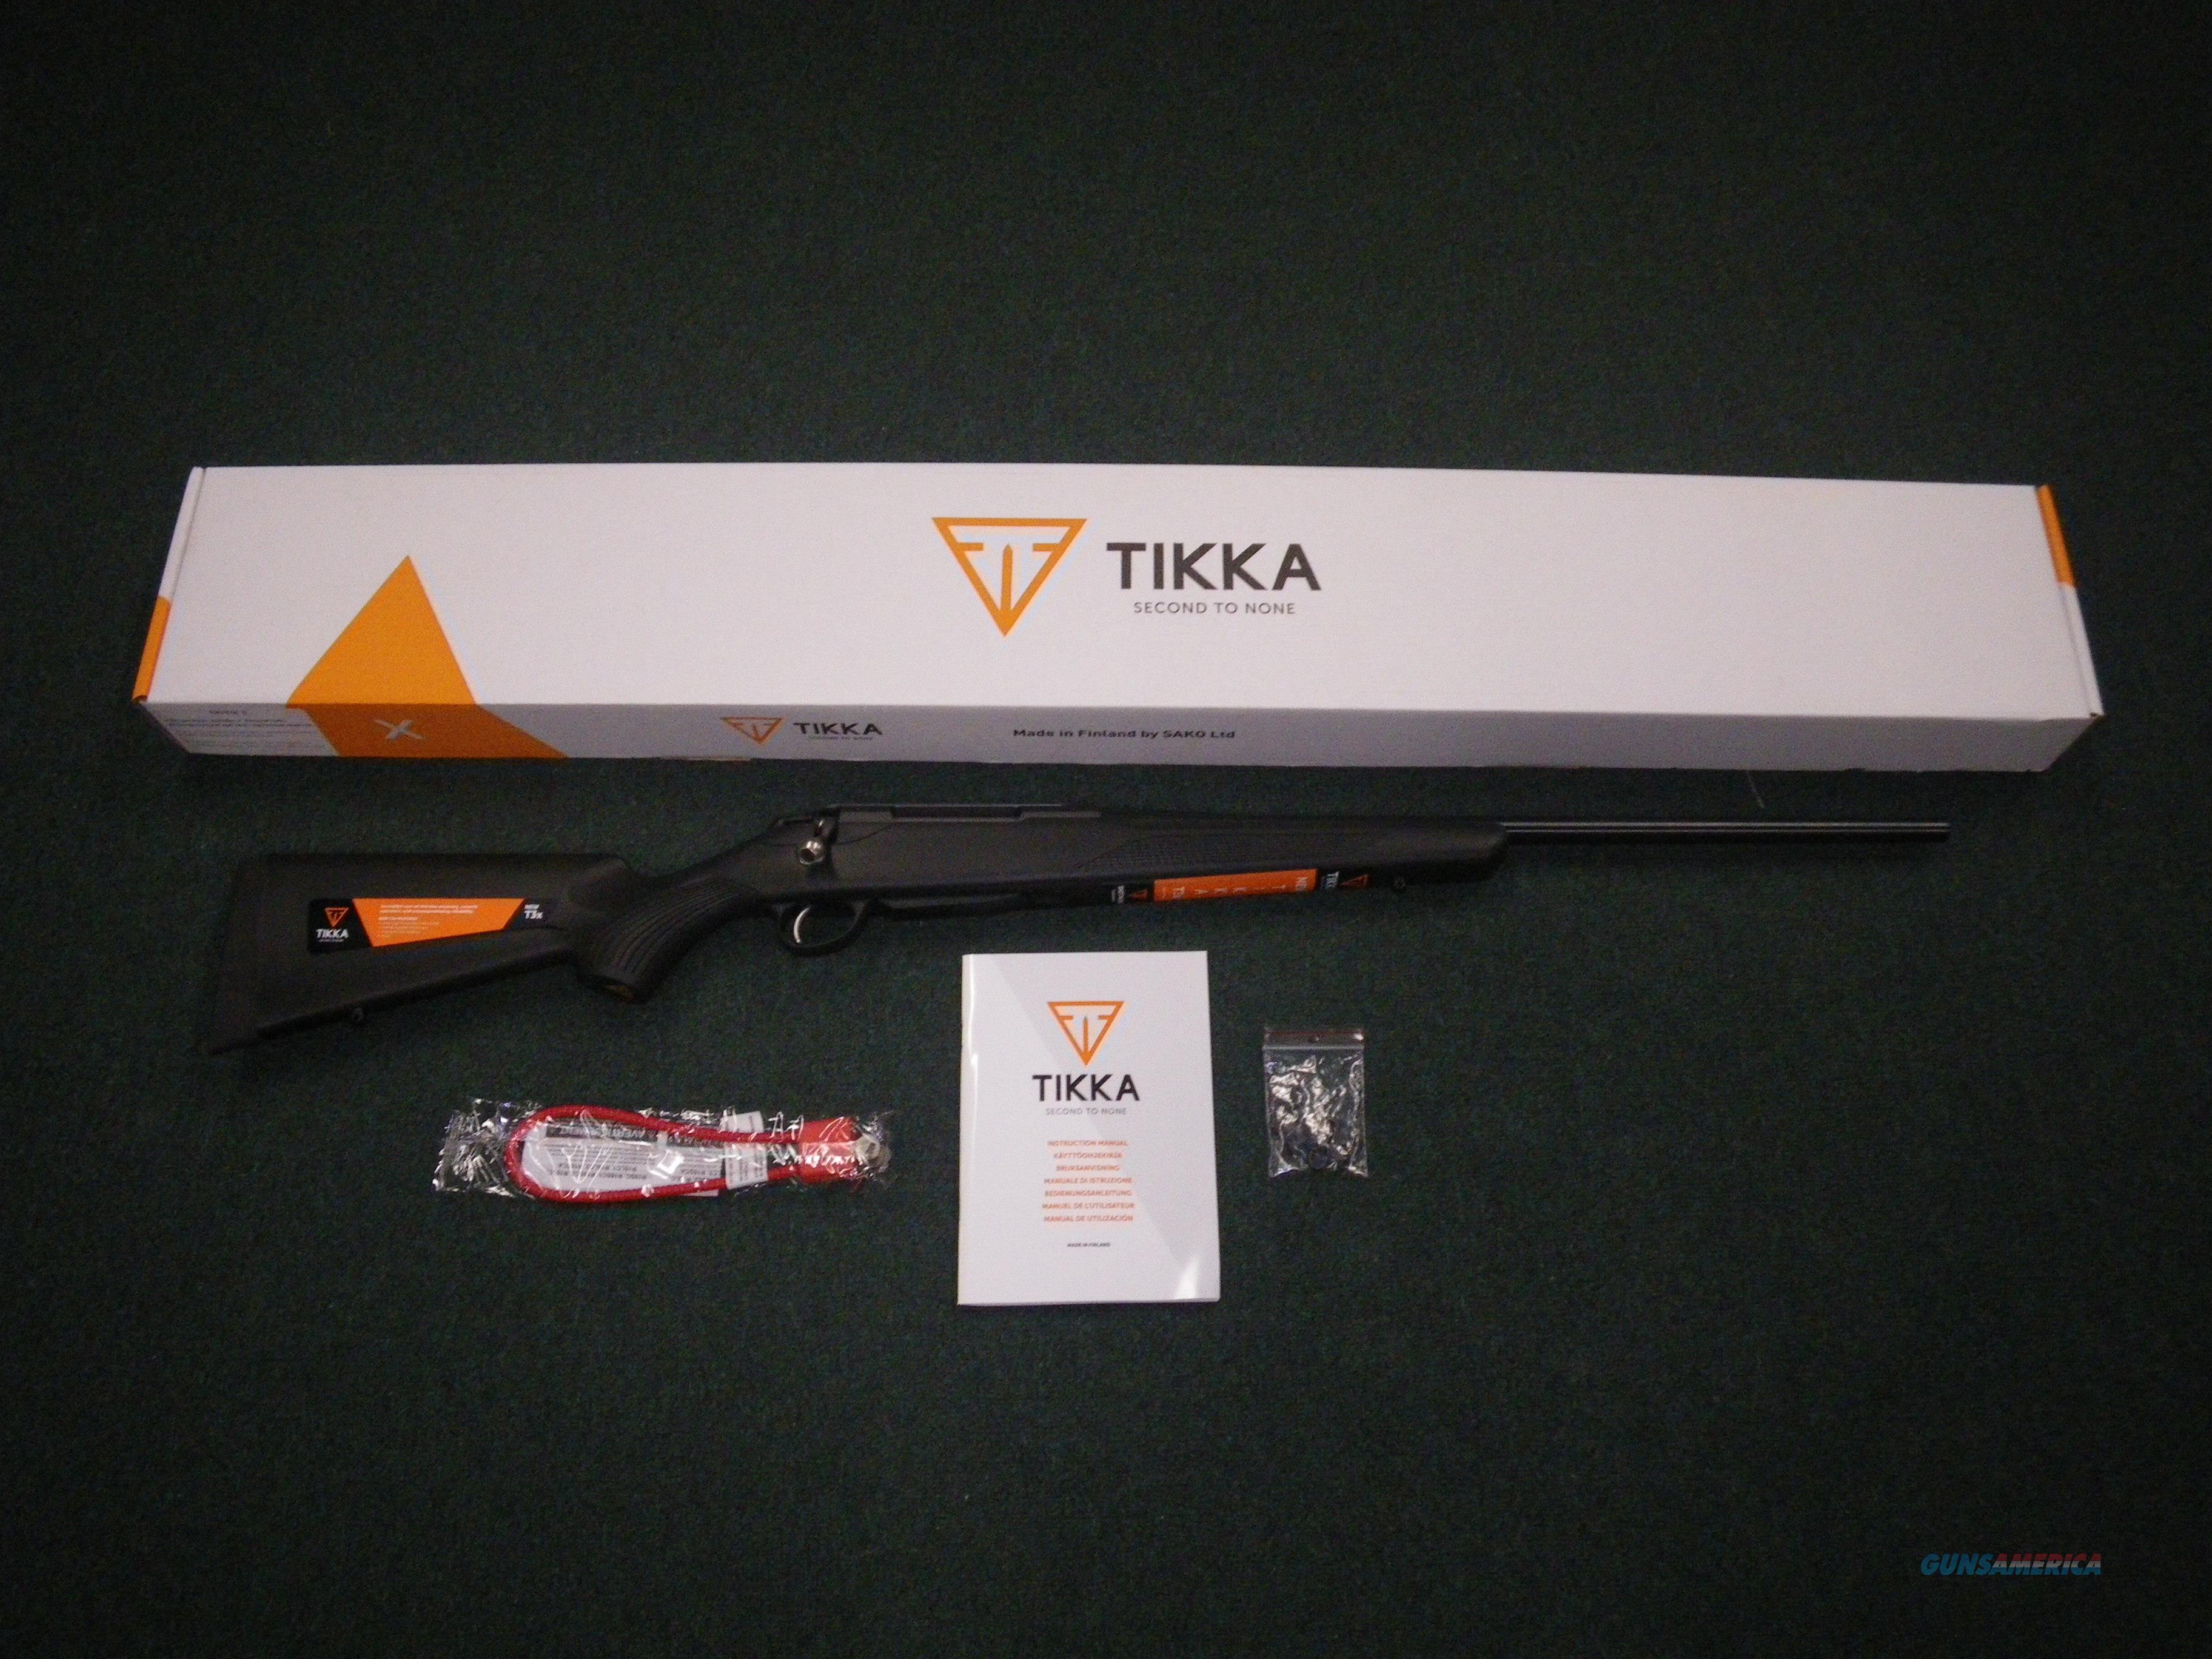 "Tikka T3x Lite Synthetic Blued 300 WSM 24.3"" NEW JRTXE341  Guns > Rifles > Tikka Rifles > T3"